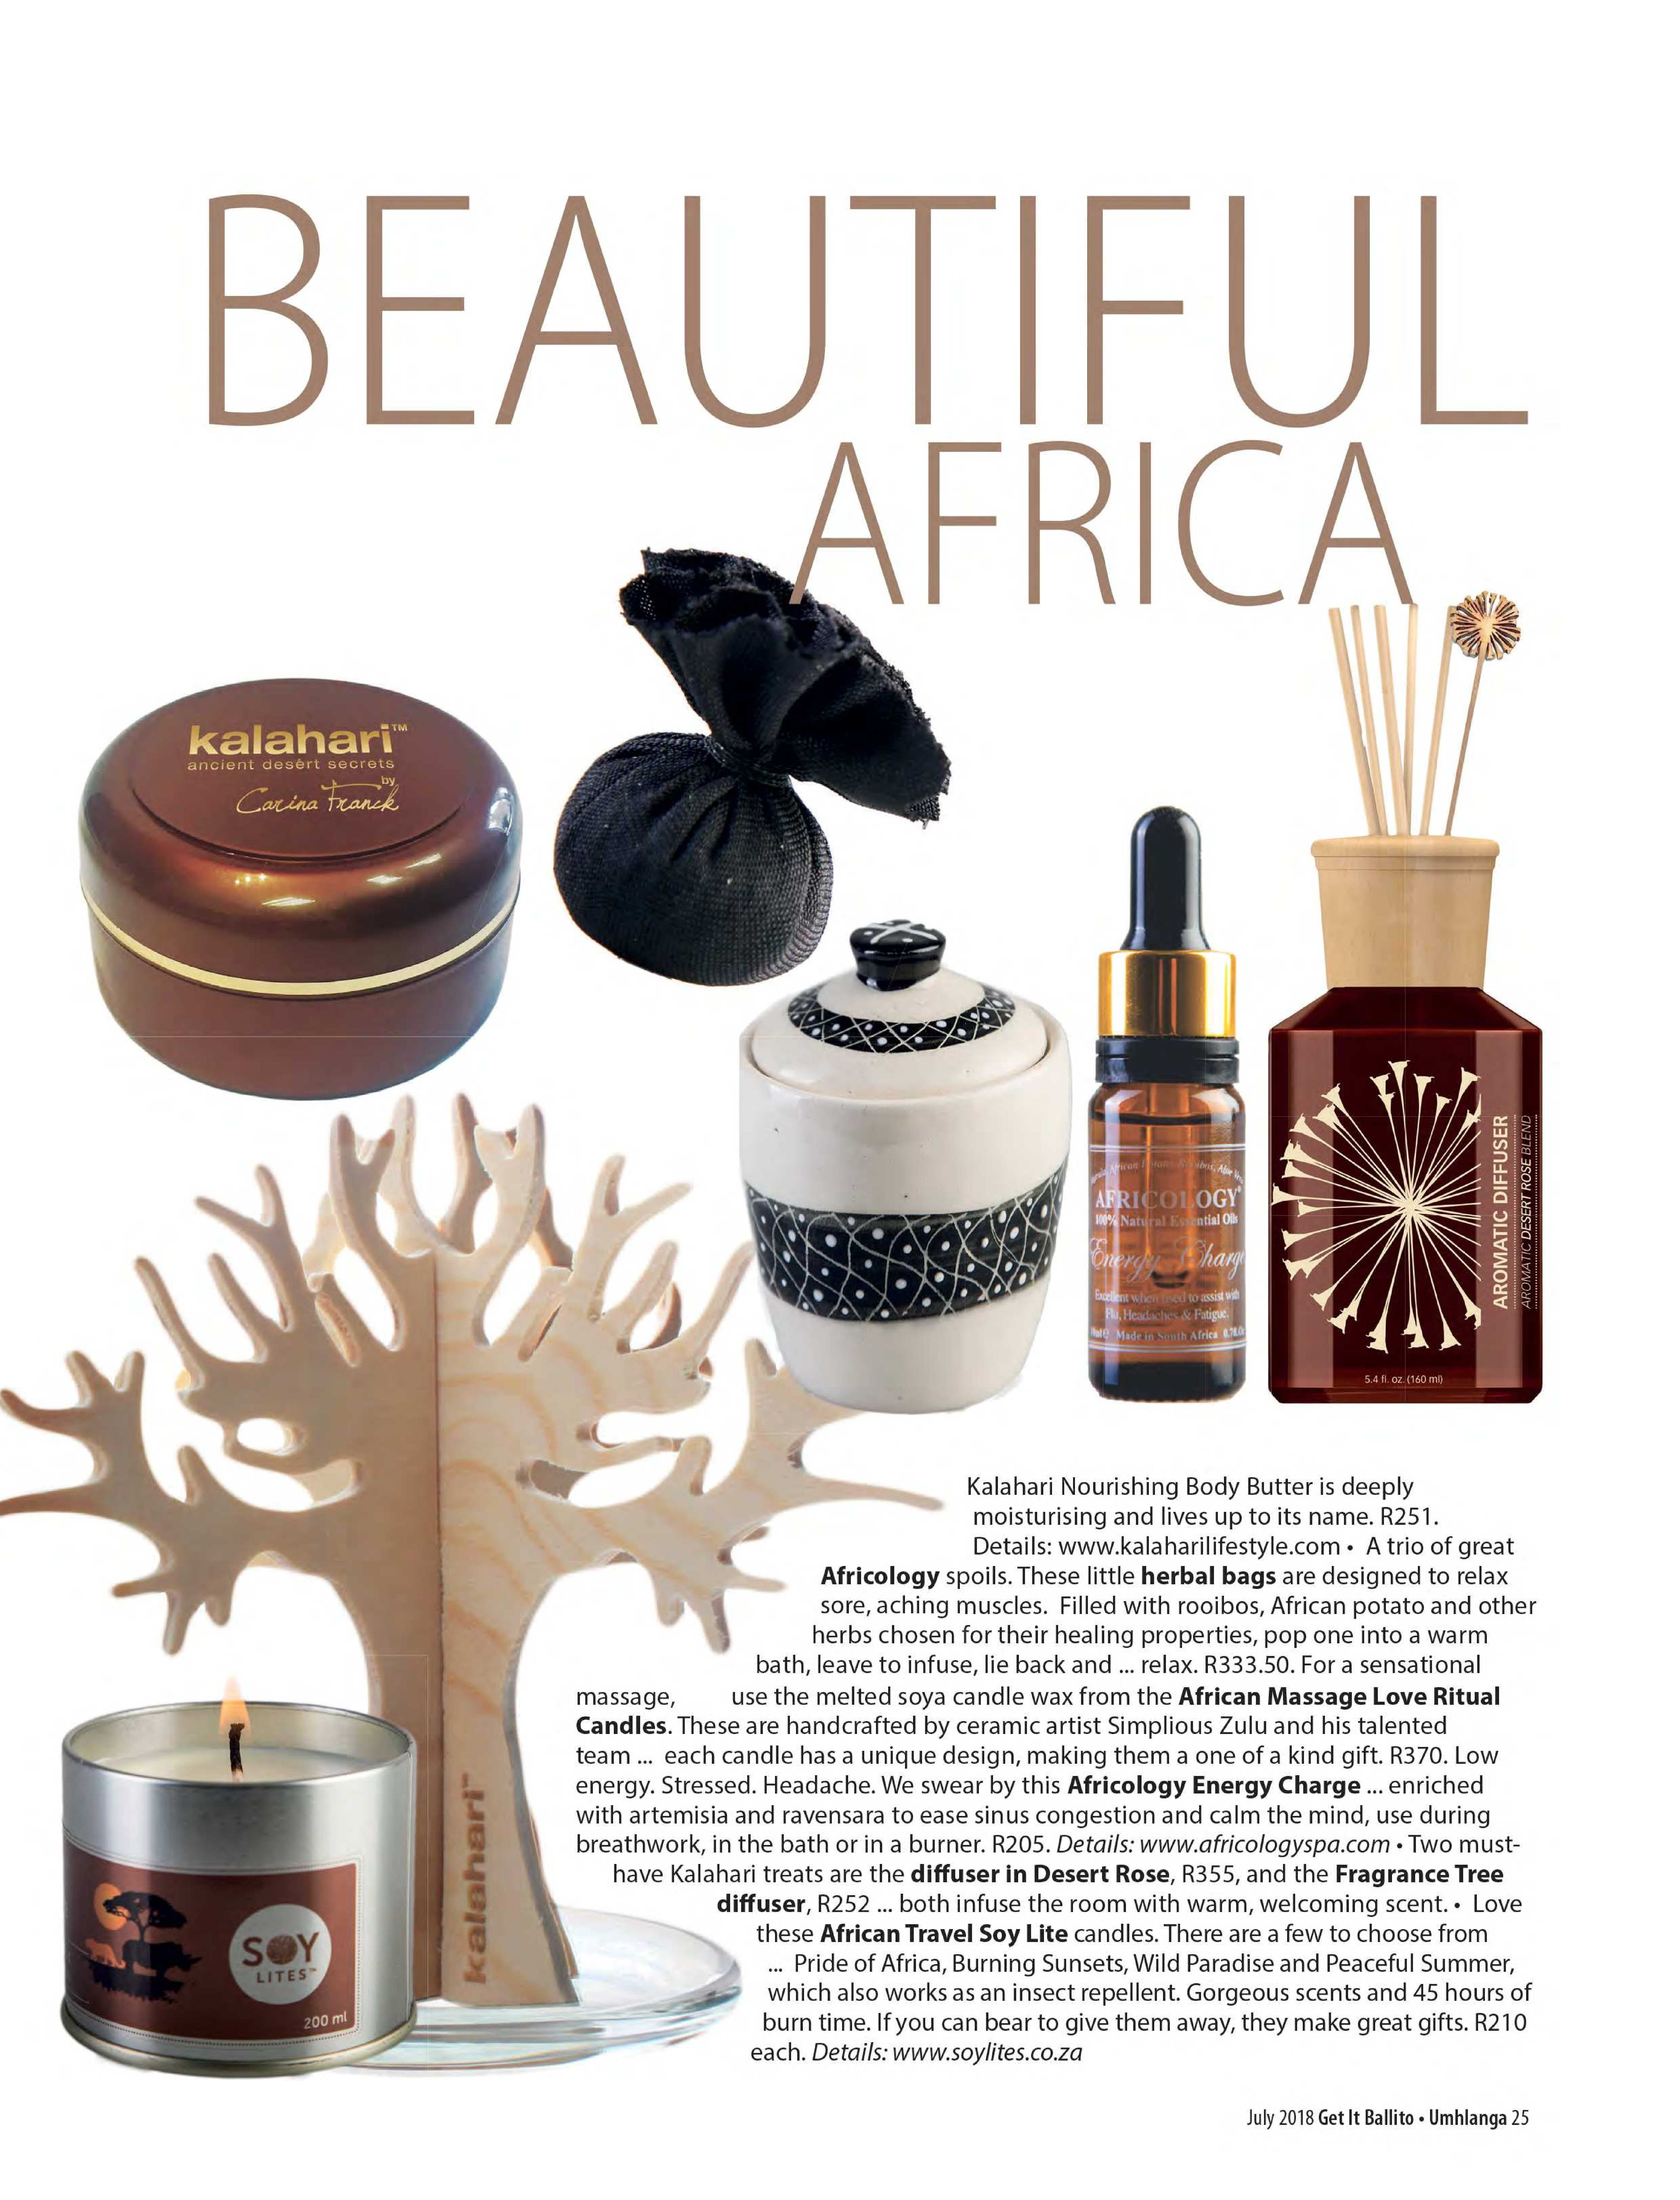 get-magazine-ballitoumhlanga-july-2018-epapers-page-27